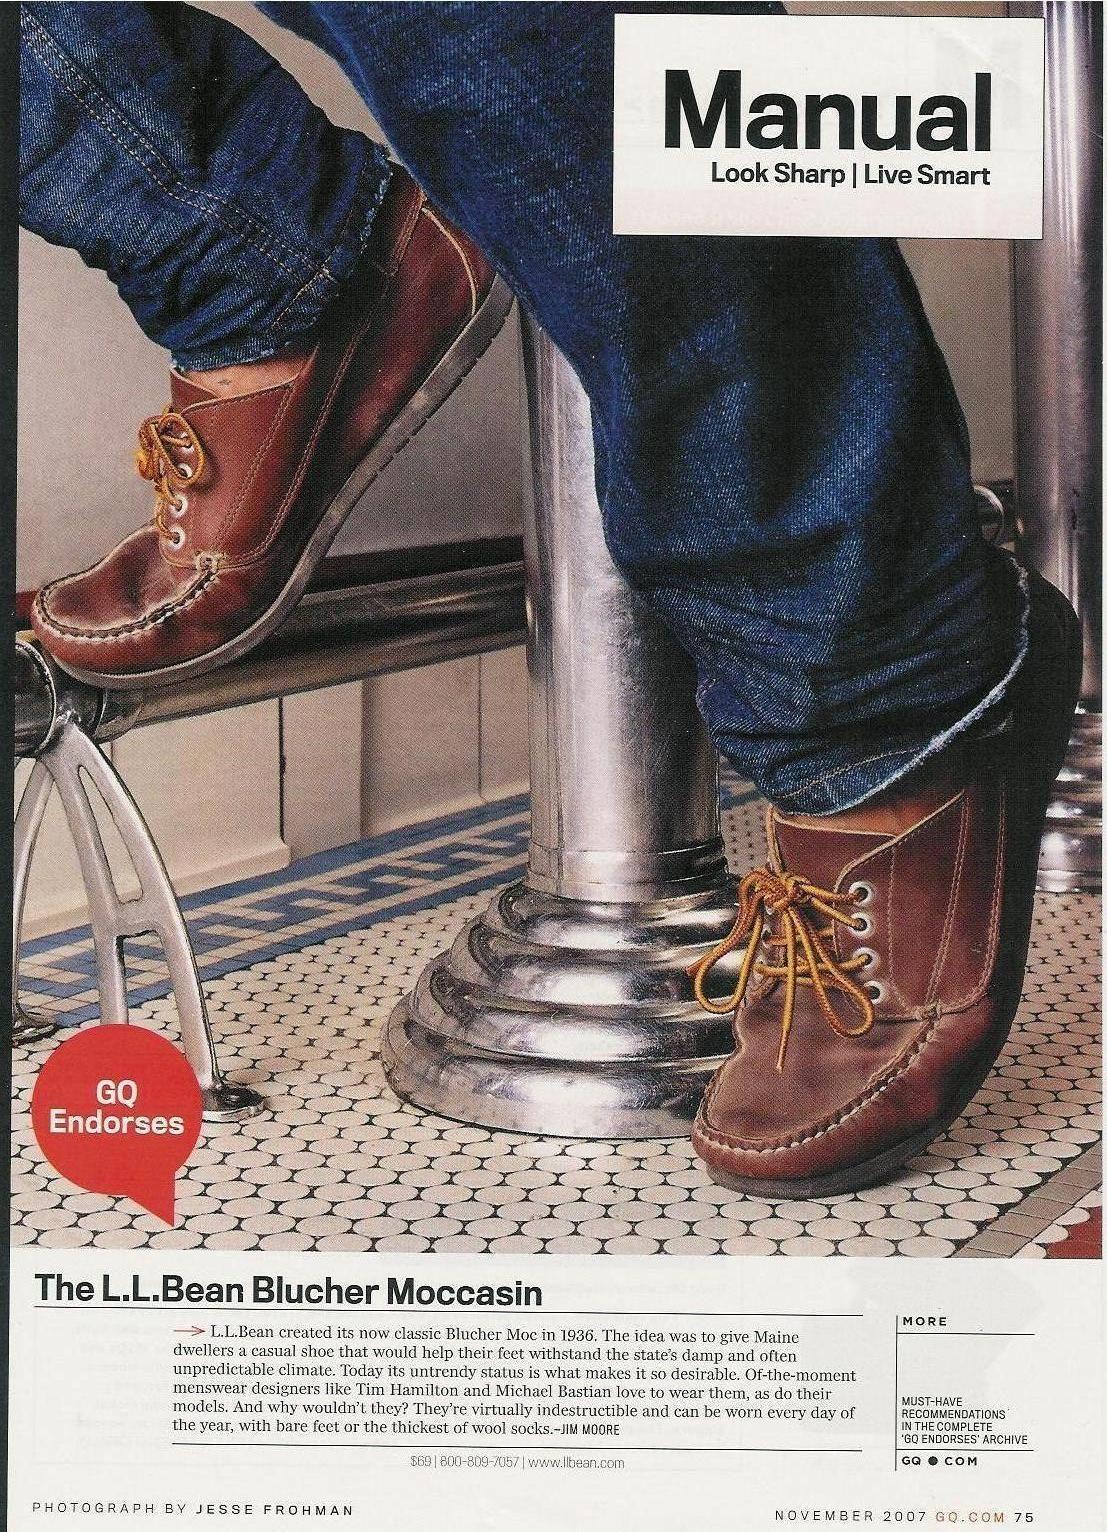 Where Can I Find These The L L Bean Blucher Moccasins